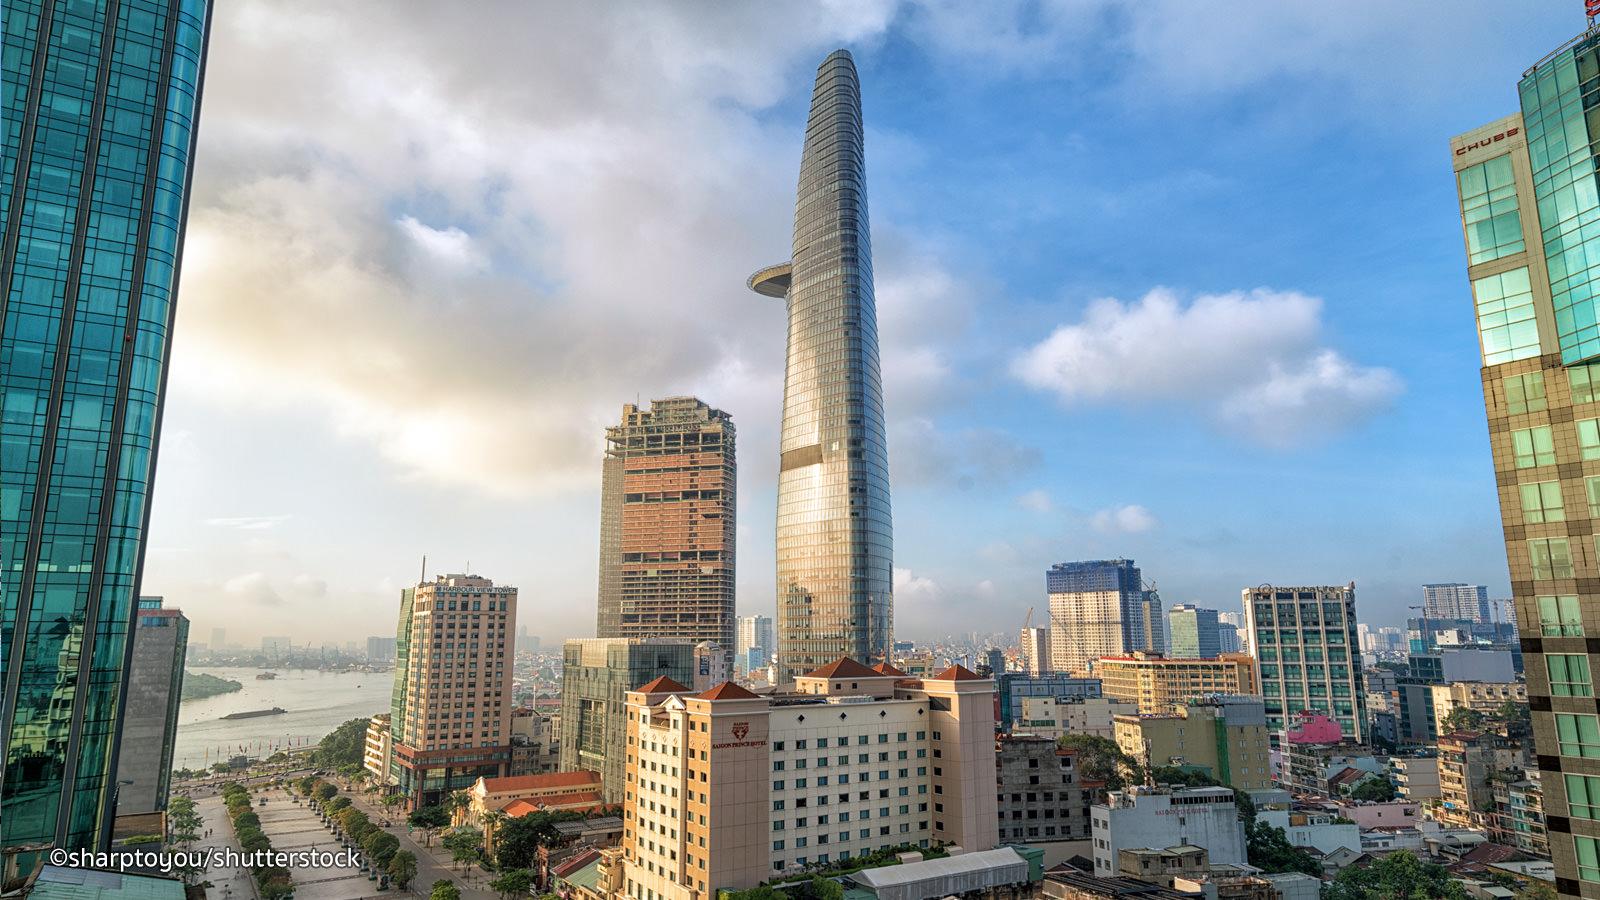 Bitexco Financial Tower sky